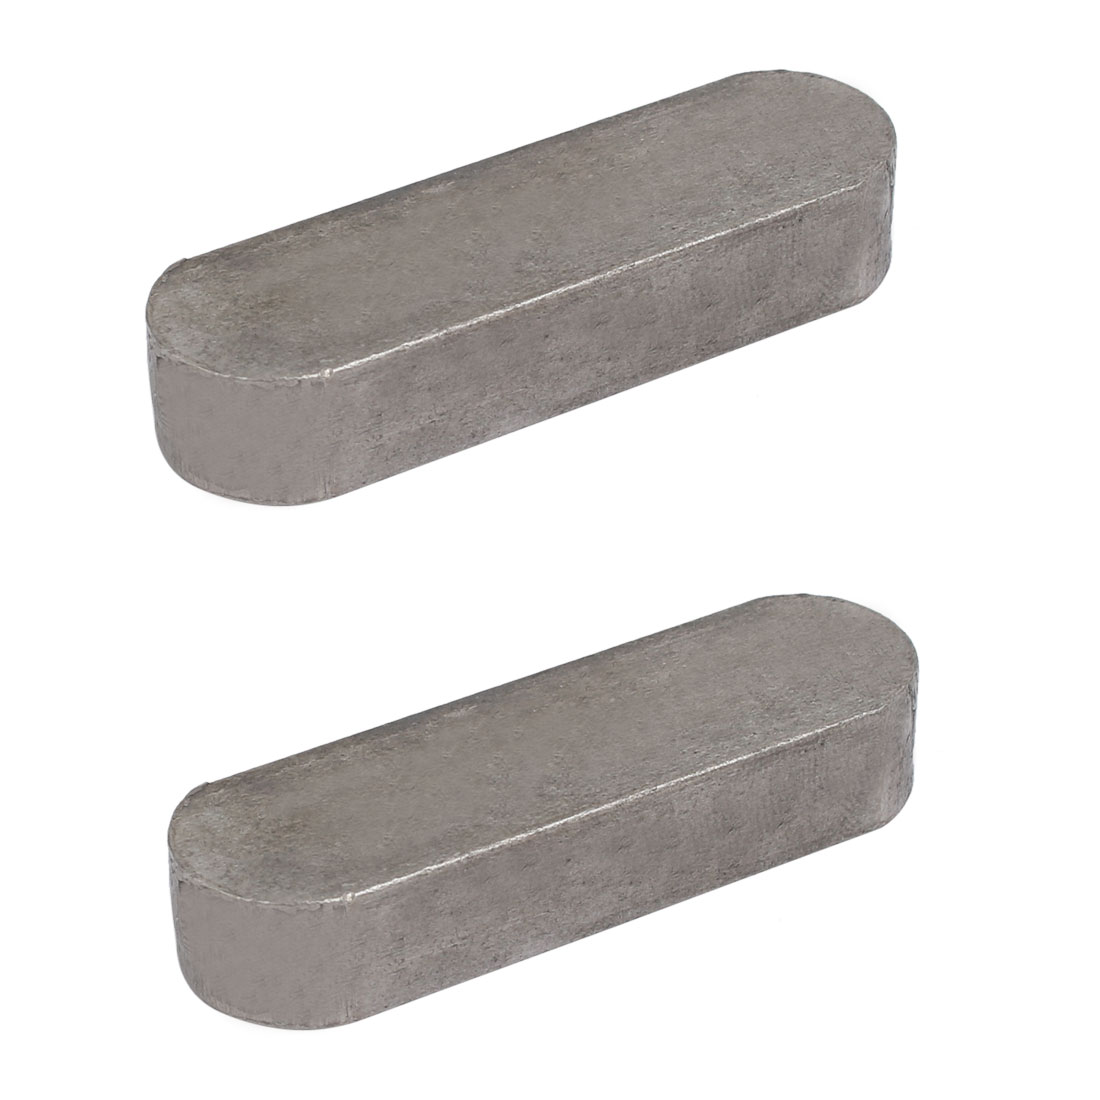 60mmx18mmx11mm Carbon Steel Key Stock To Lock Pulleys 2pcs